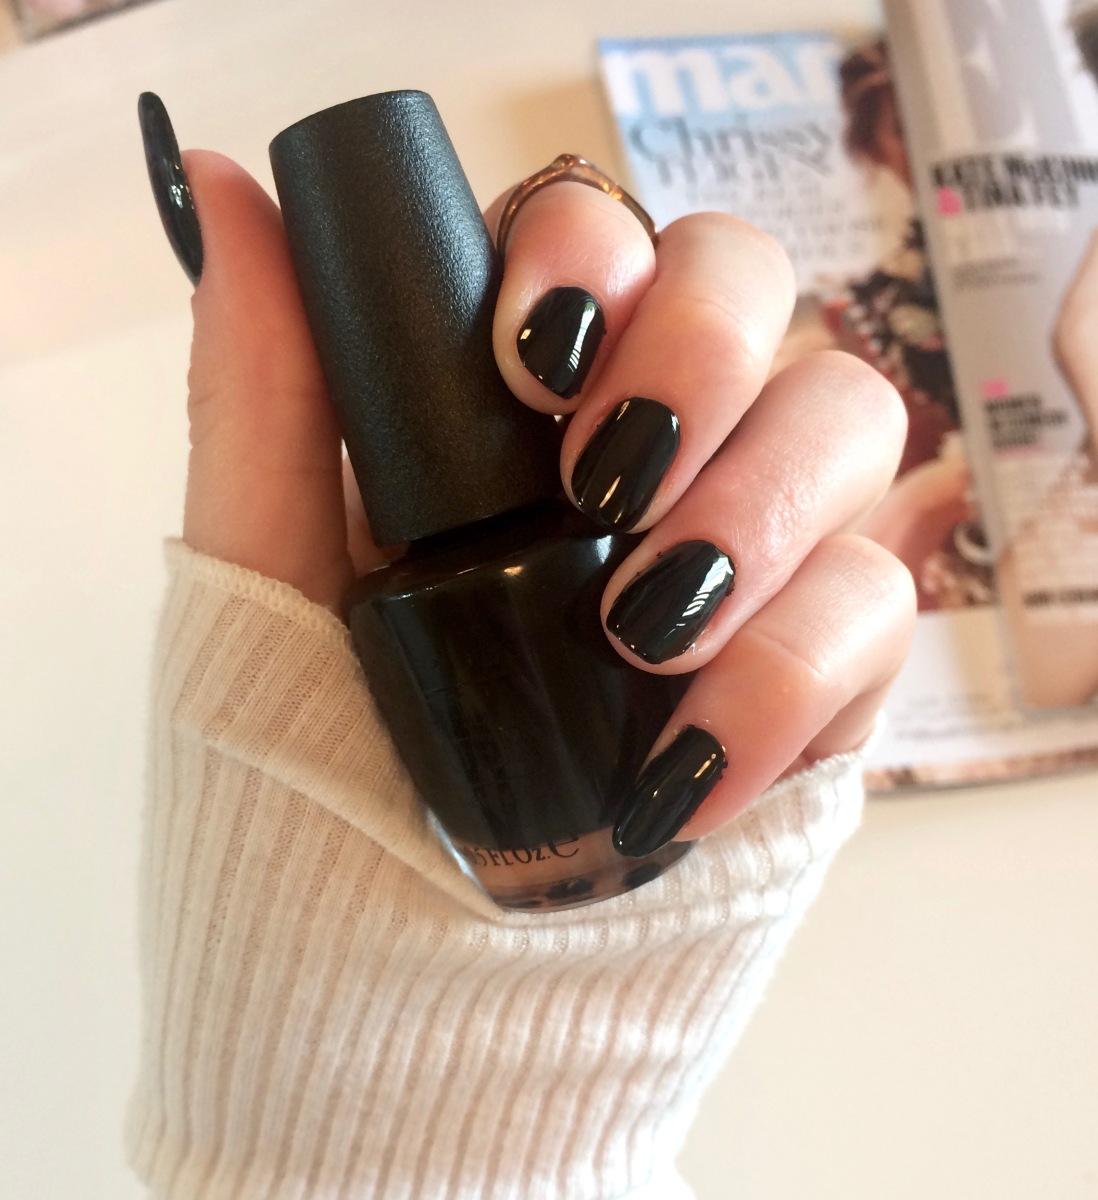 Classy Black Nails – TAYLOR DOROTHY